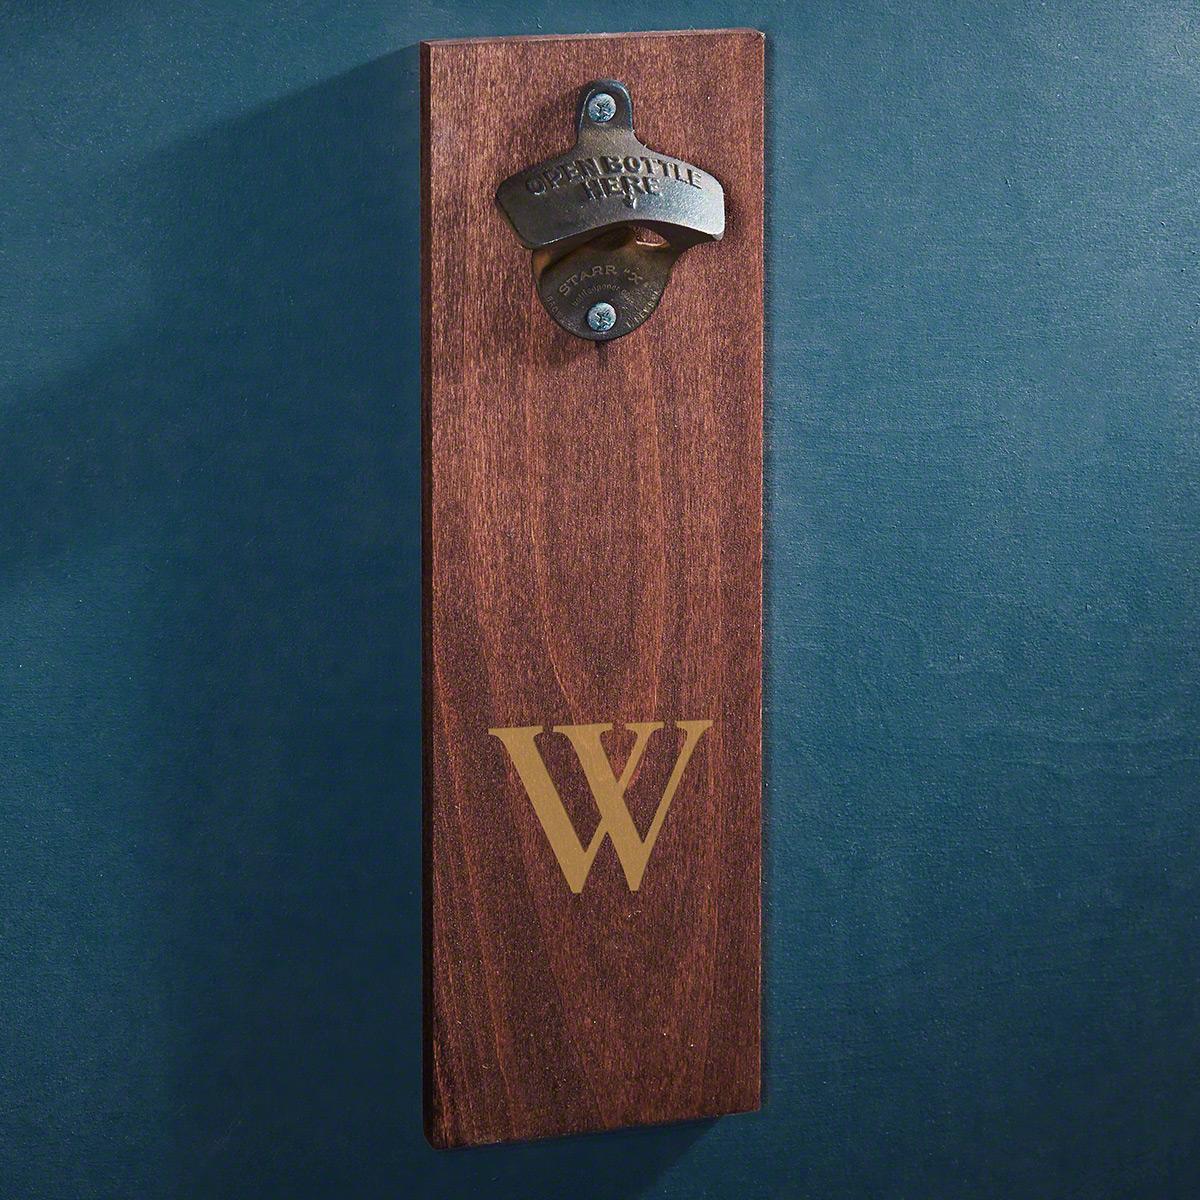 Personalized-Wooden-Wall-Bottle-Opener